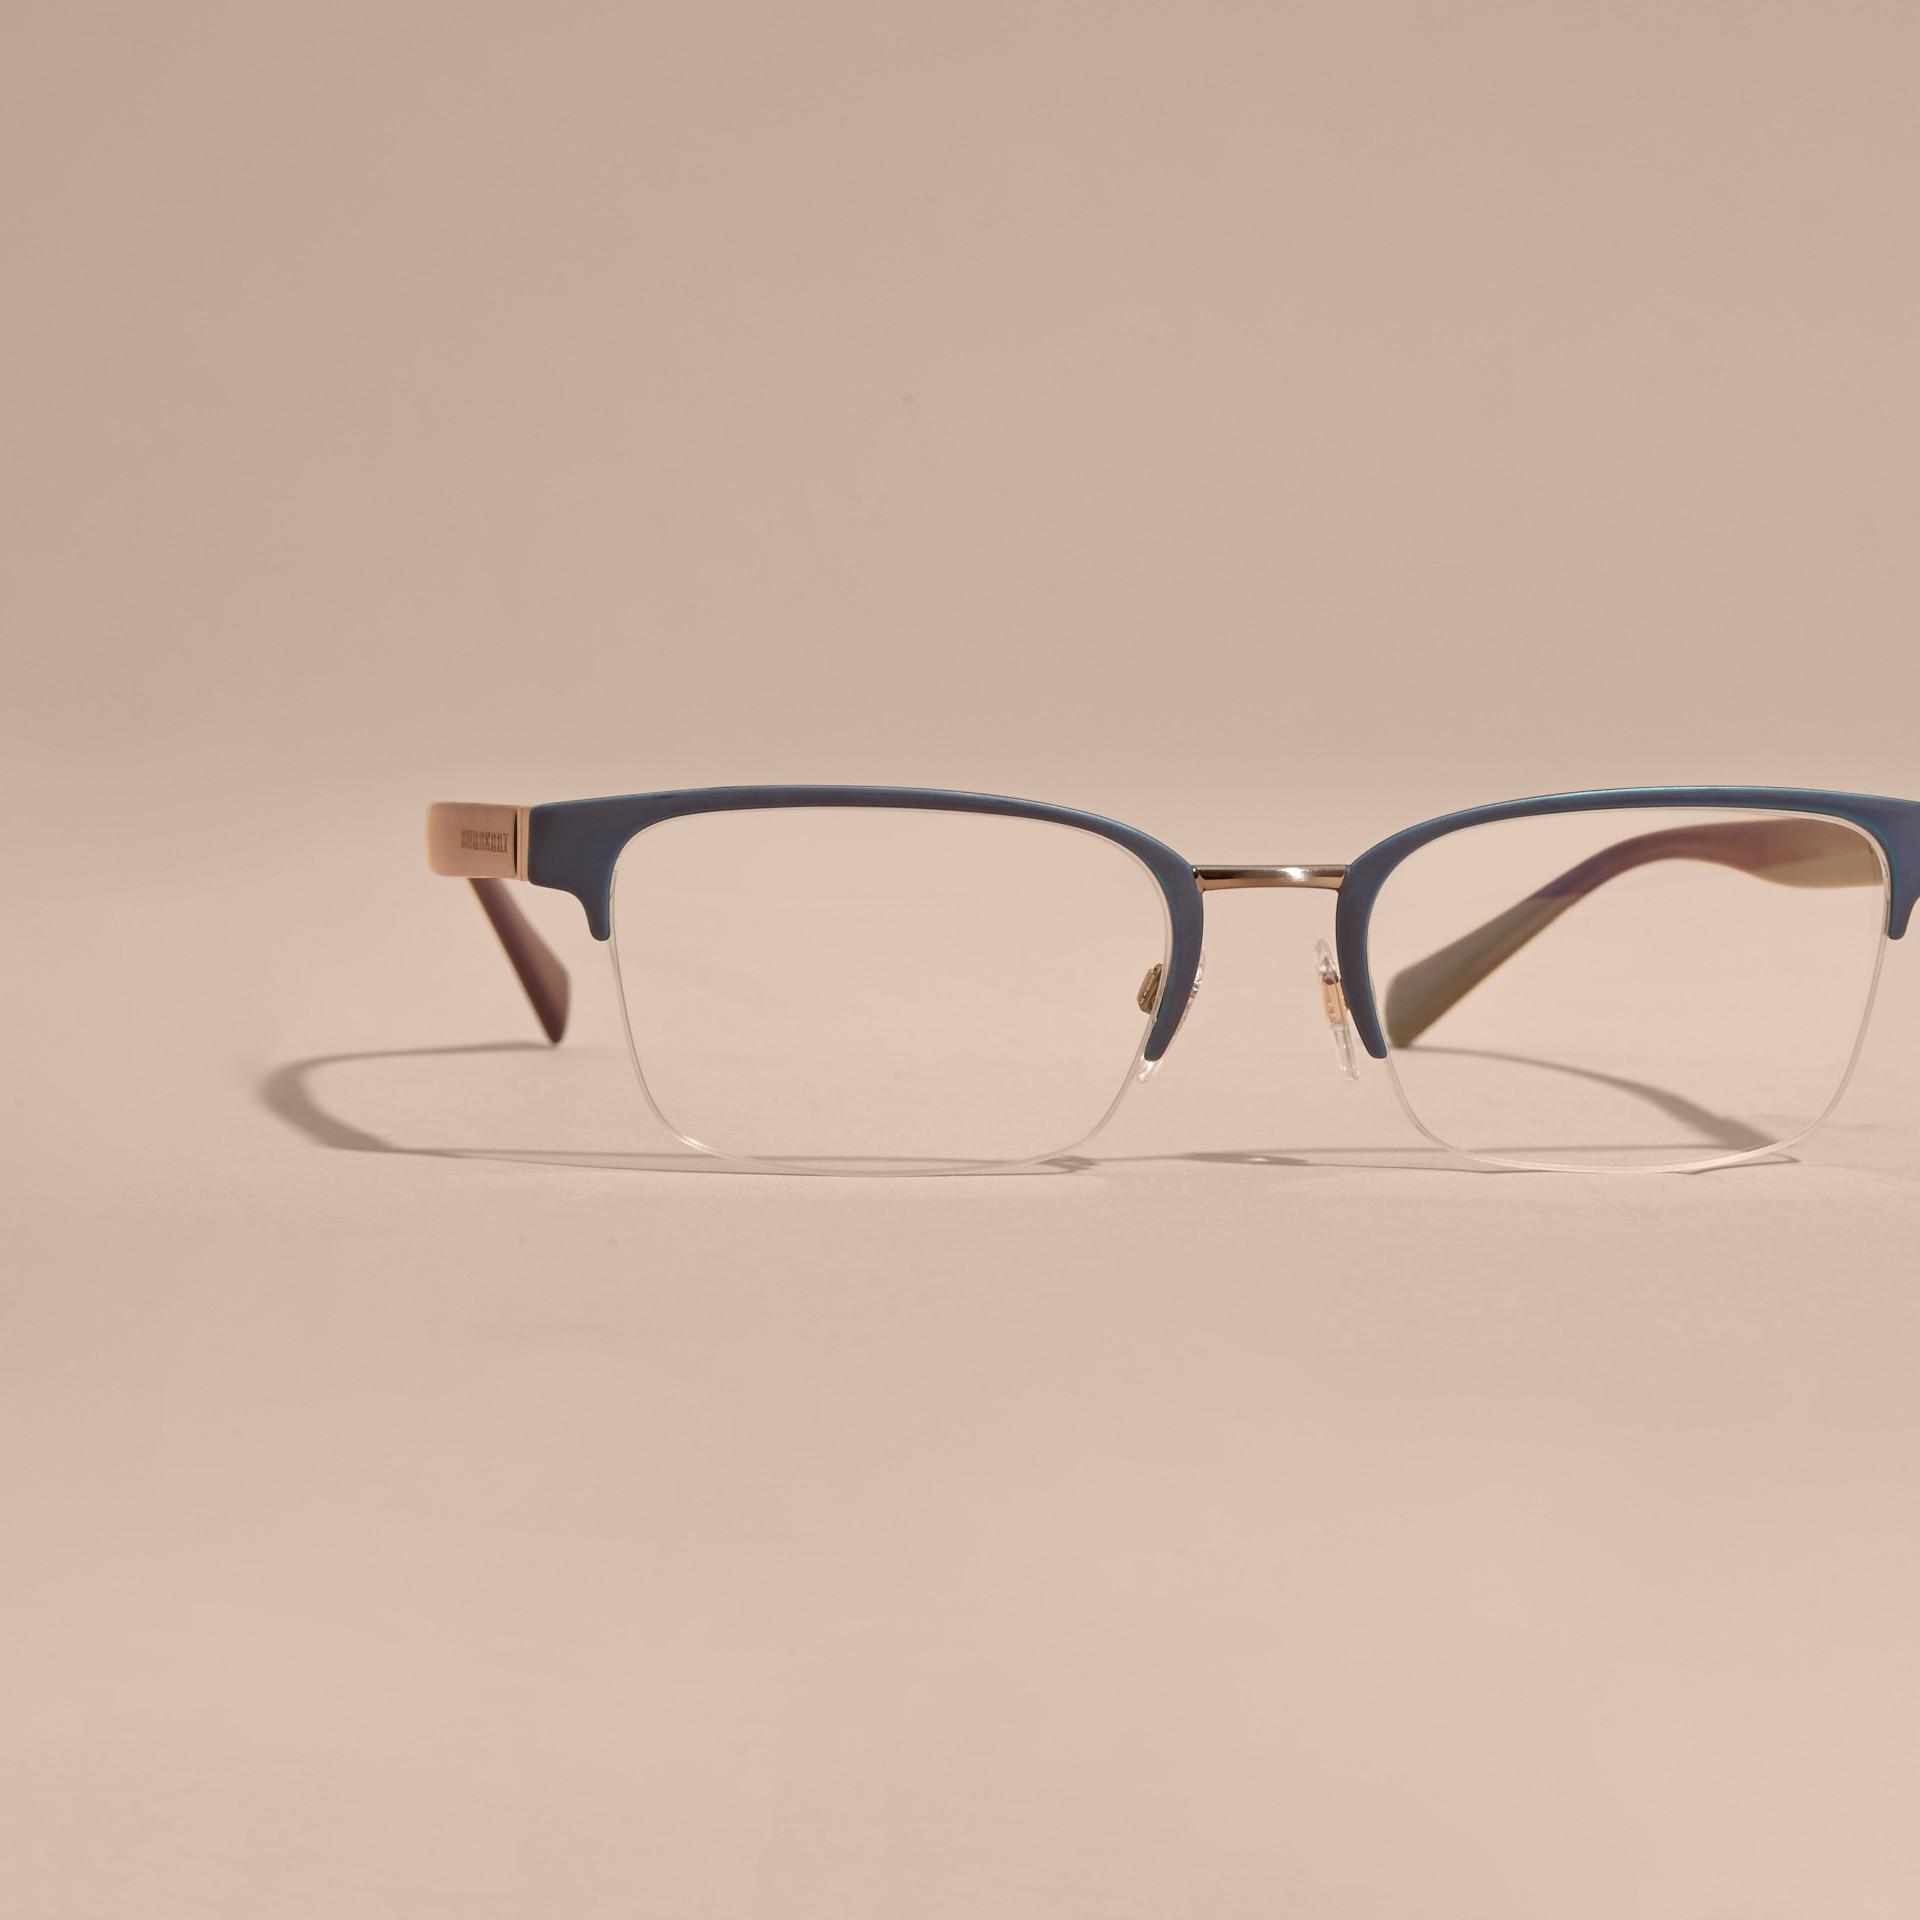 Burberry Half Frame Glasses : Half-rimmed Rectangular Optical Frames Dark Navy Burberry